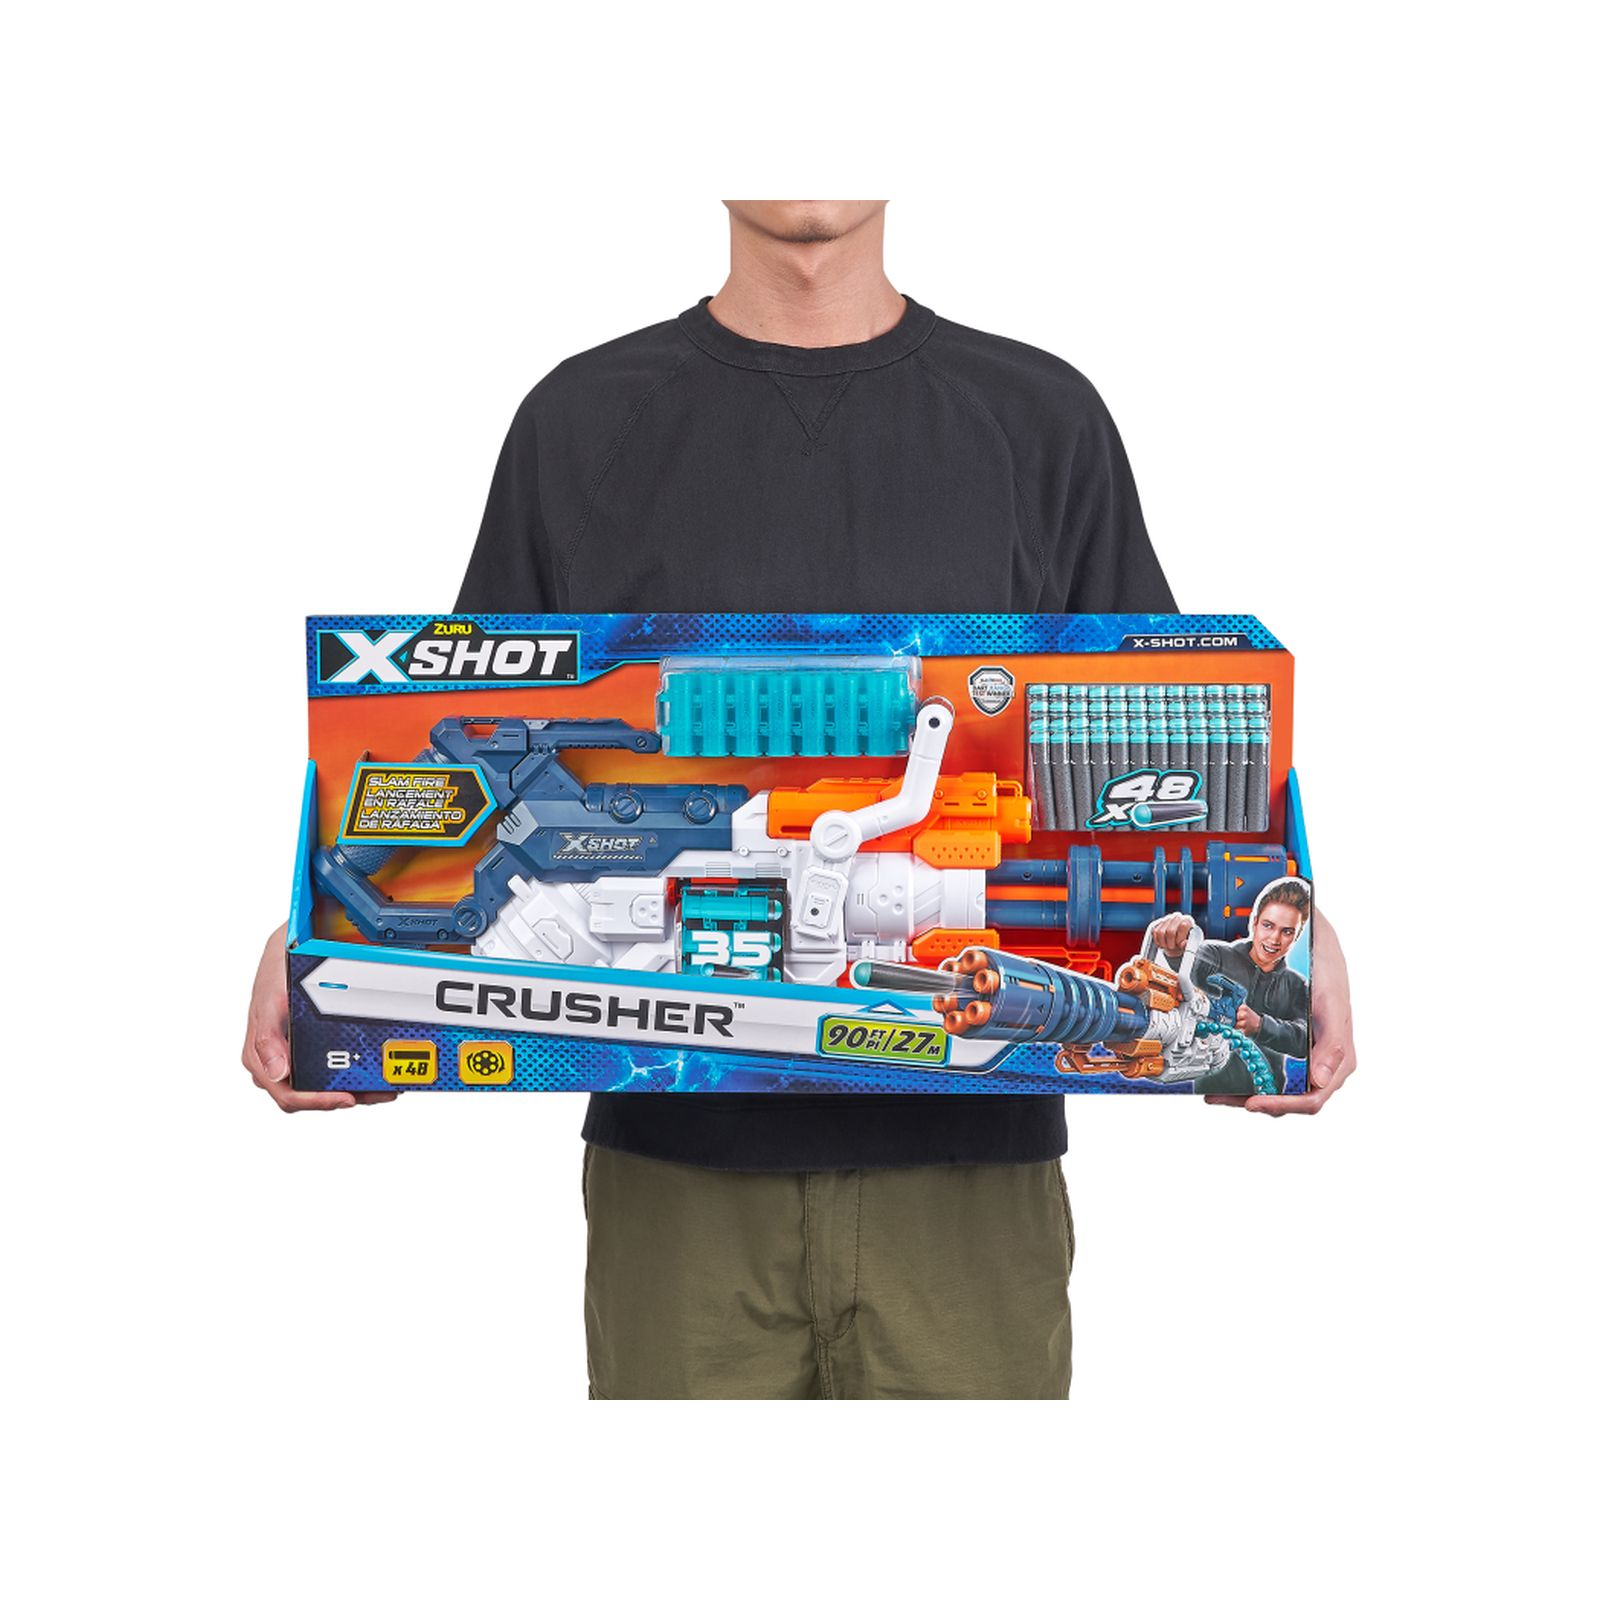 Fucile x-shot crusher - SUPERSTAR